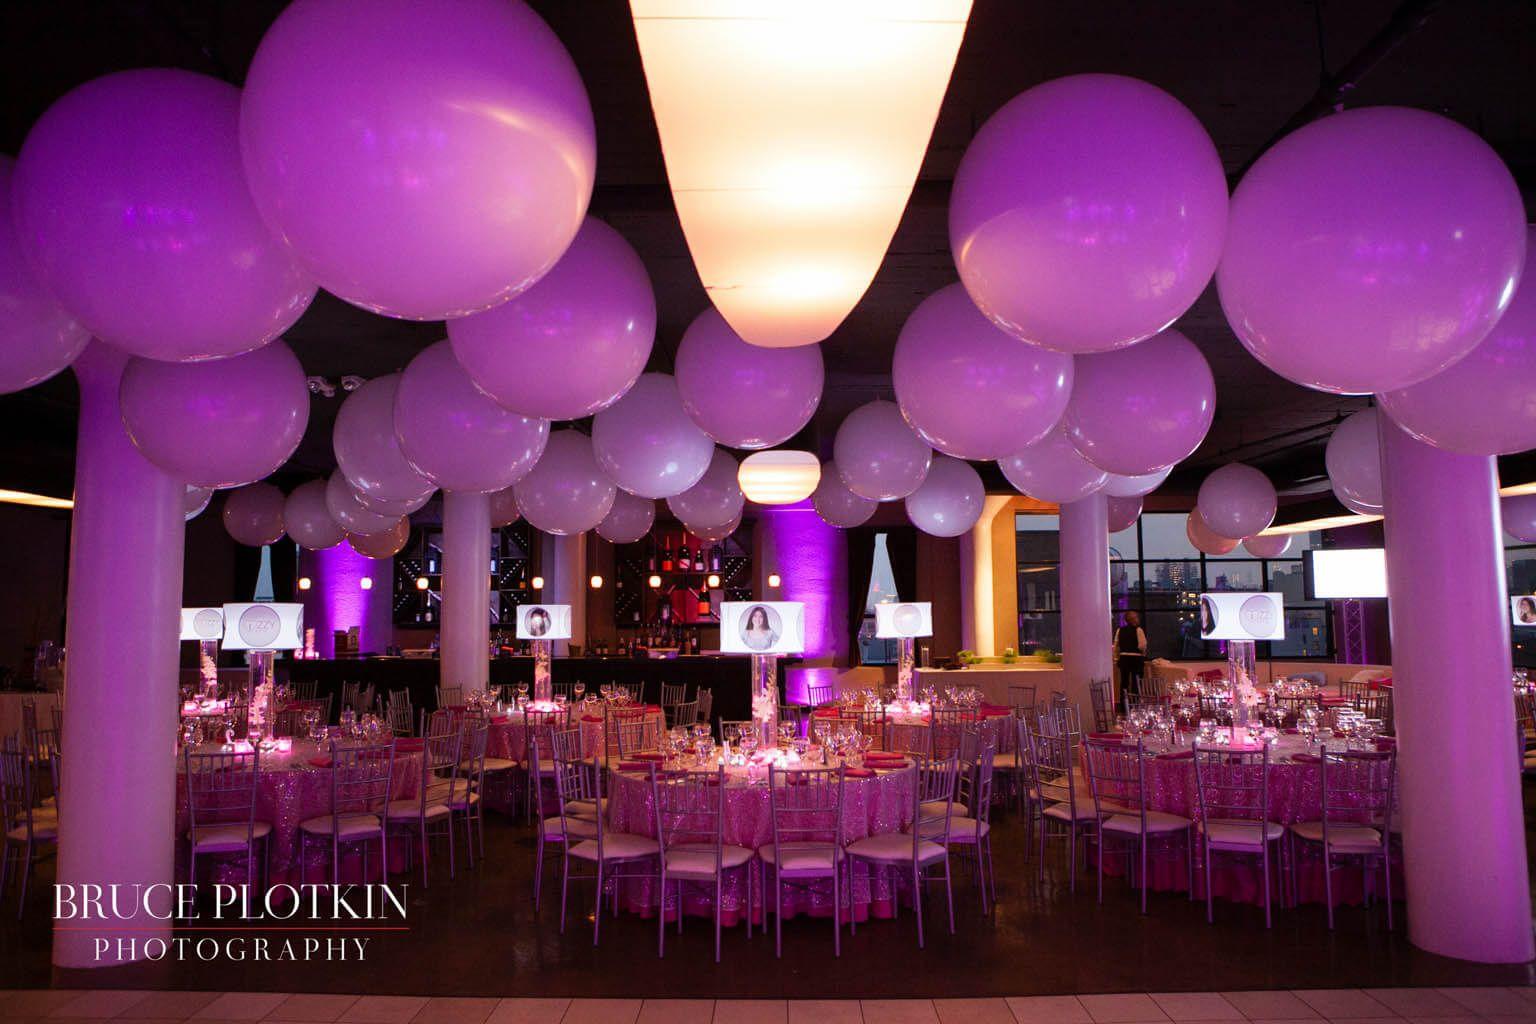 Tags bar and bat mitzvah event decor themes venues - Bat Mitzvah Party Decorator